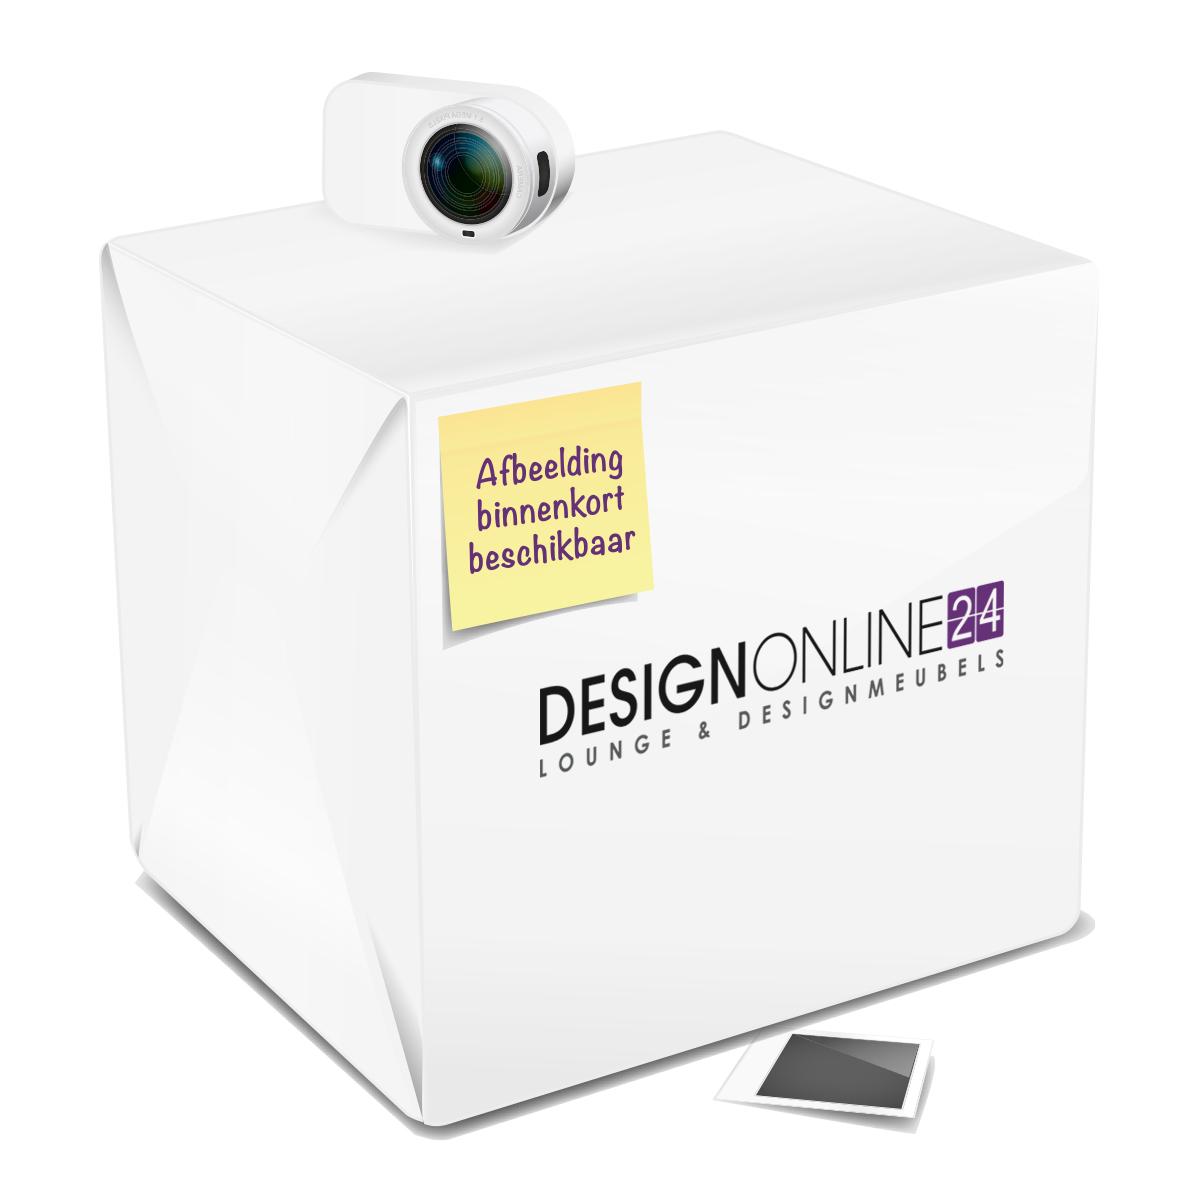 Innovation Slaapbank Cubed 140 Deluxe - Chromen Poten - Mixed Dance 524 - Oranje/Rood